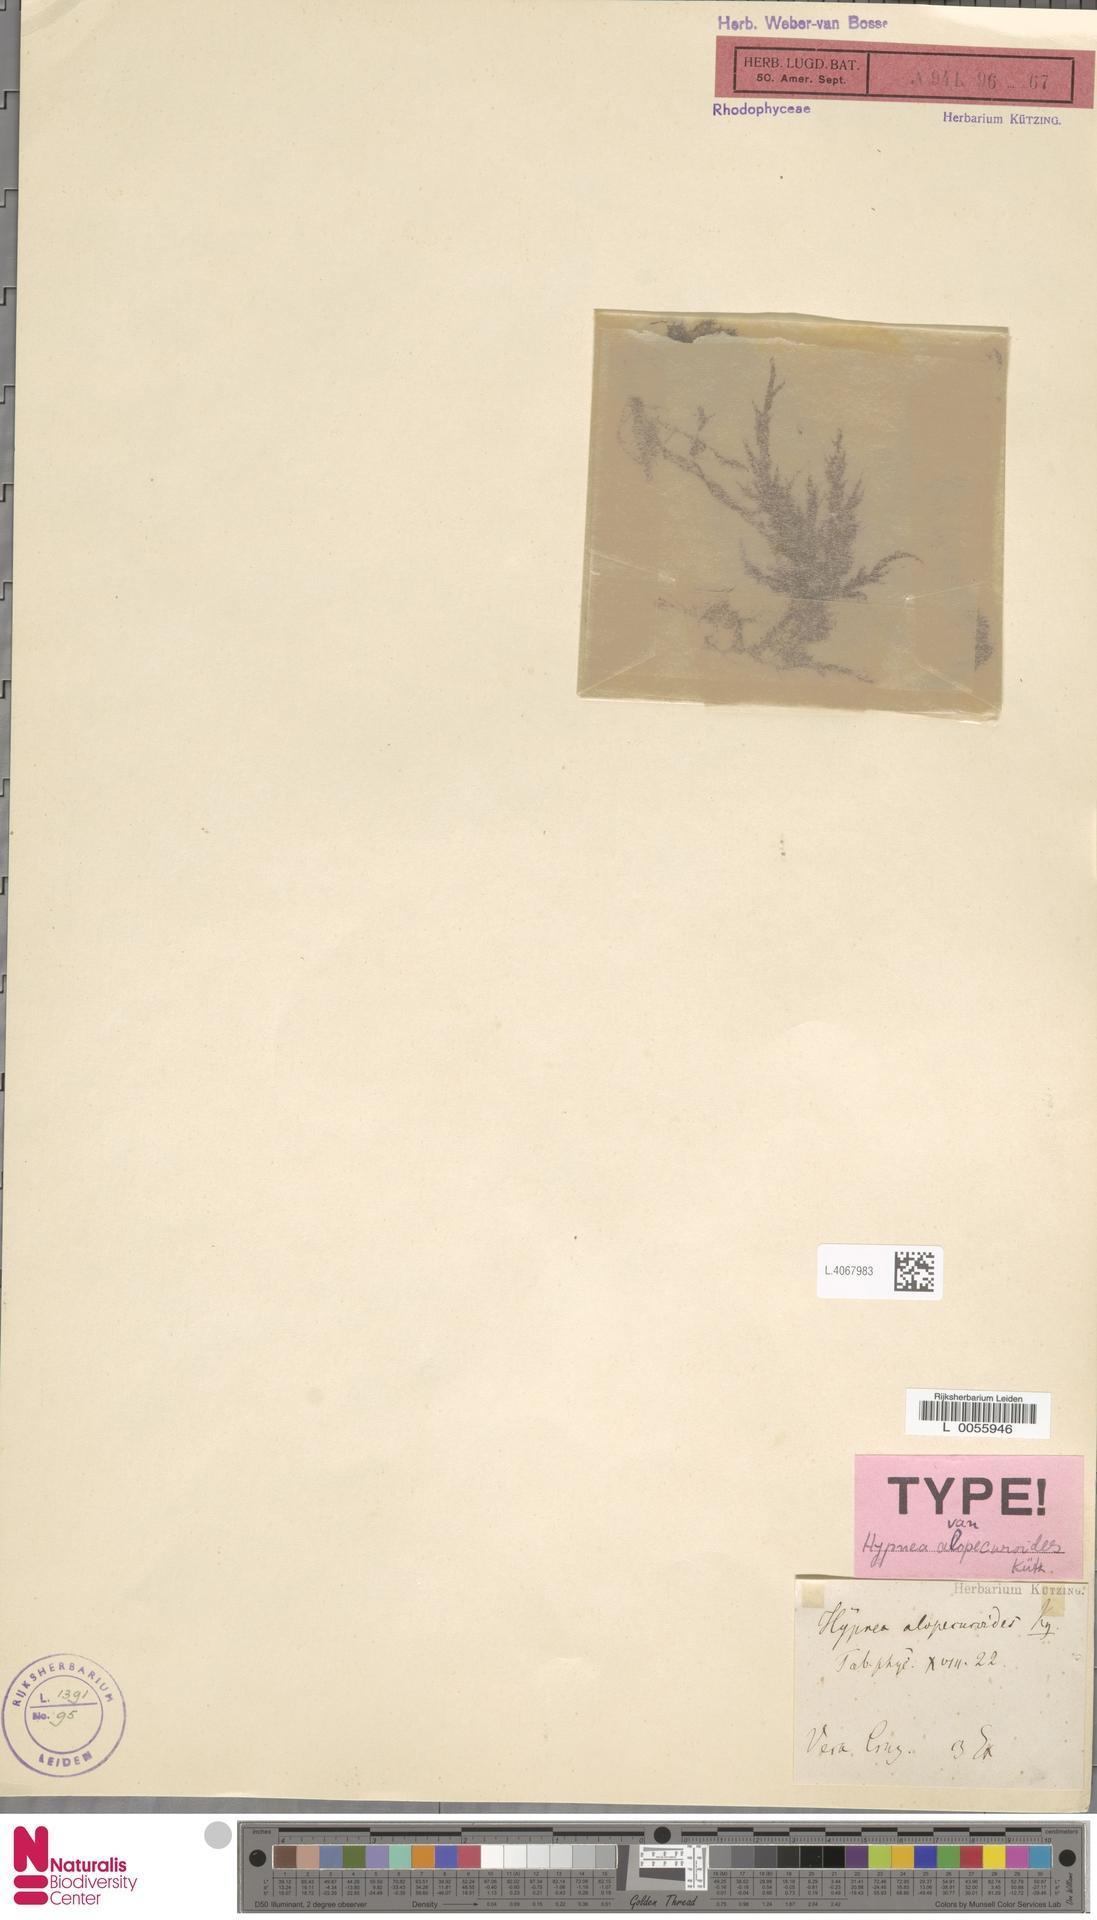 Image of Hypnea